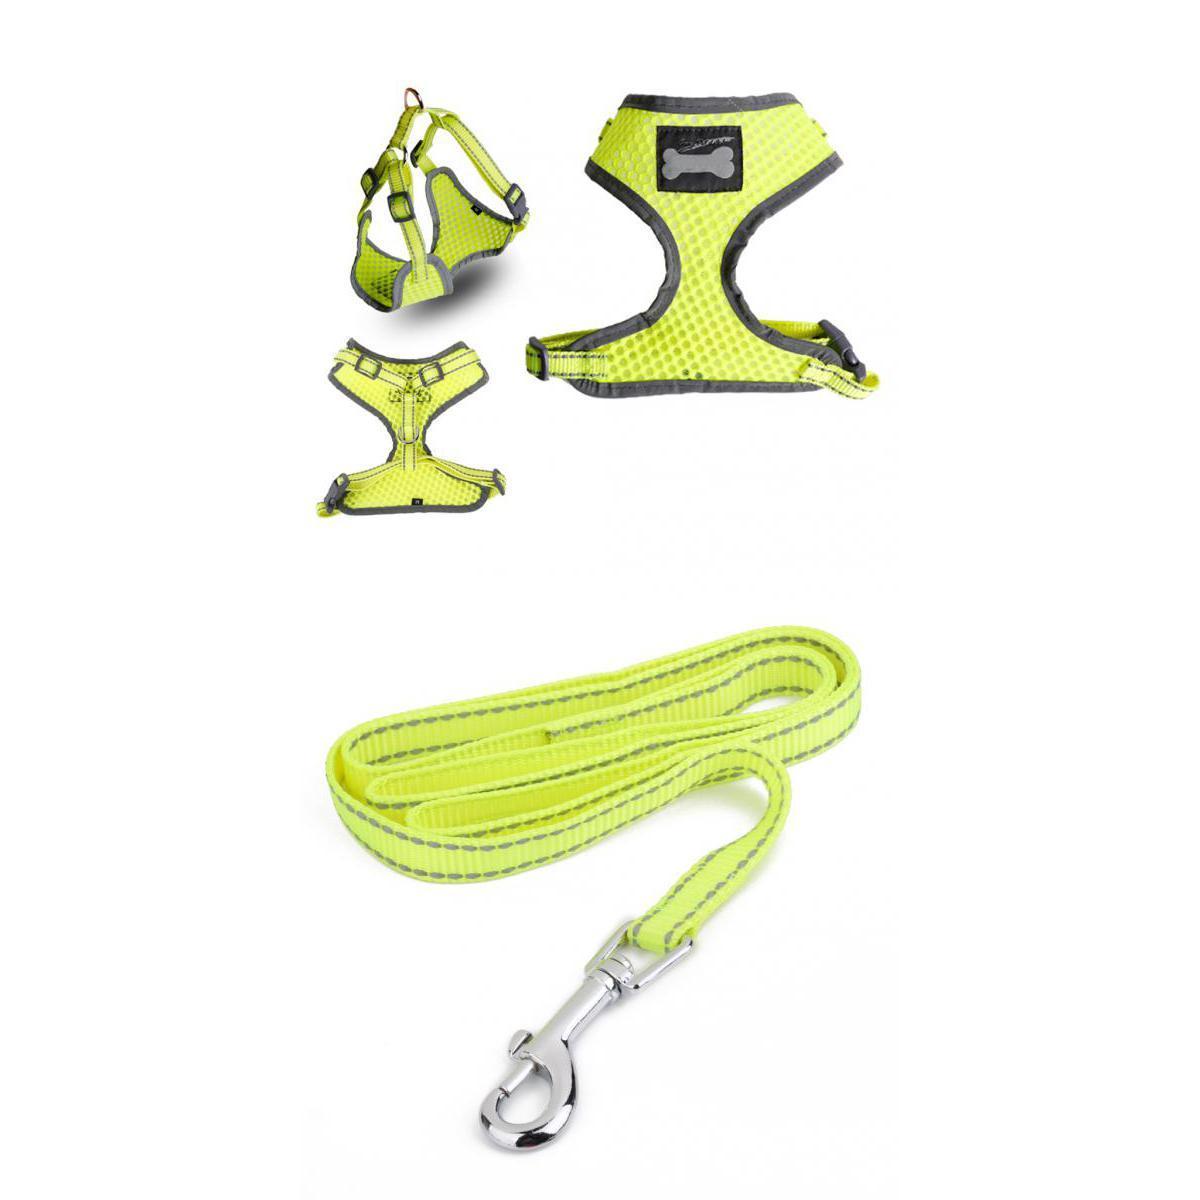 Reflective Mesh Nylon Pet Dog Walking Collar Strap Harness and Leash Yellow M